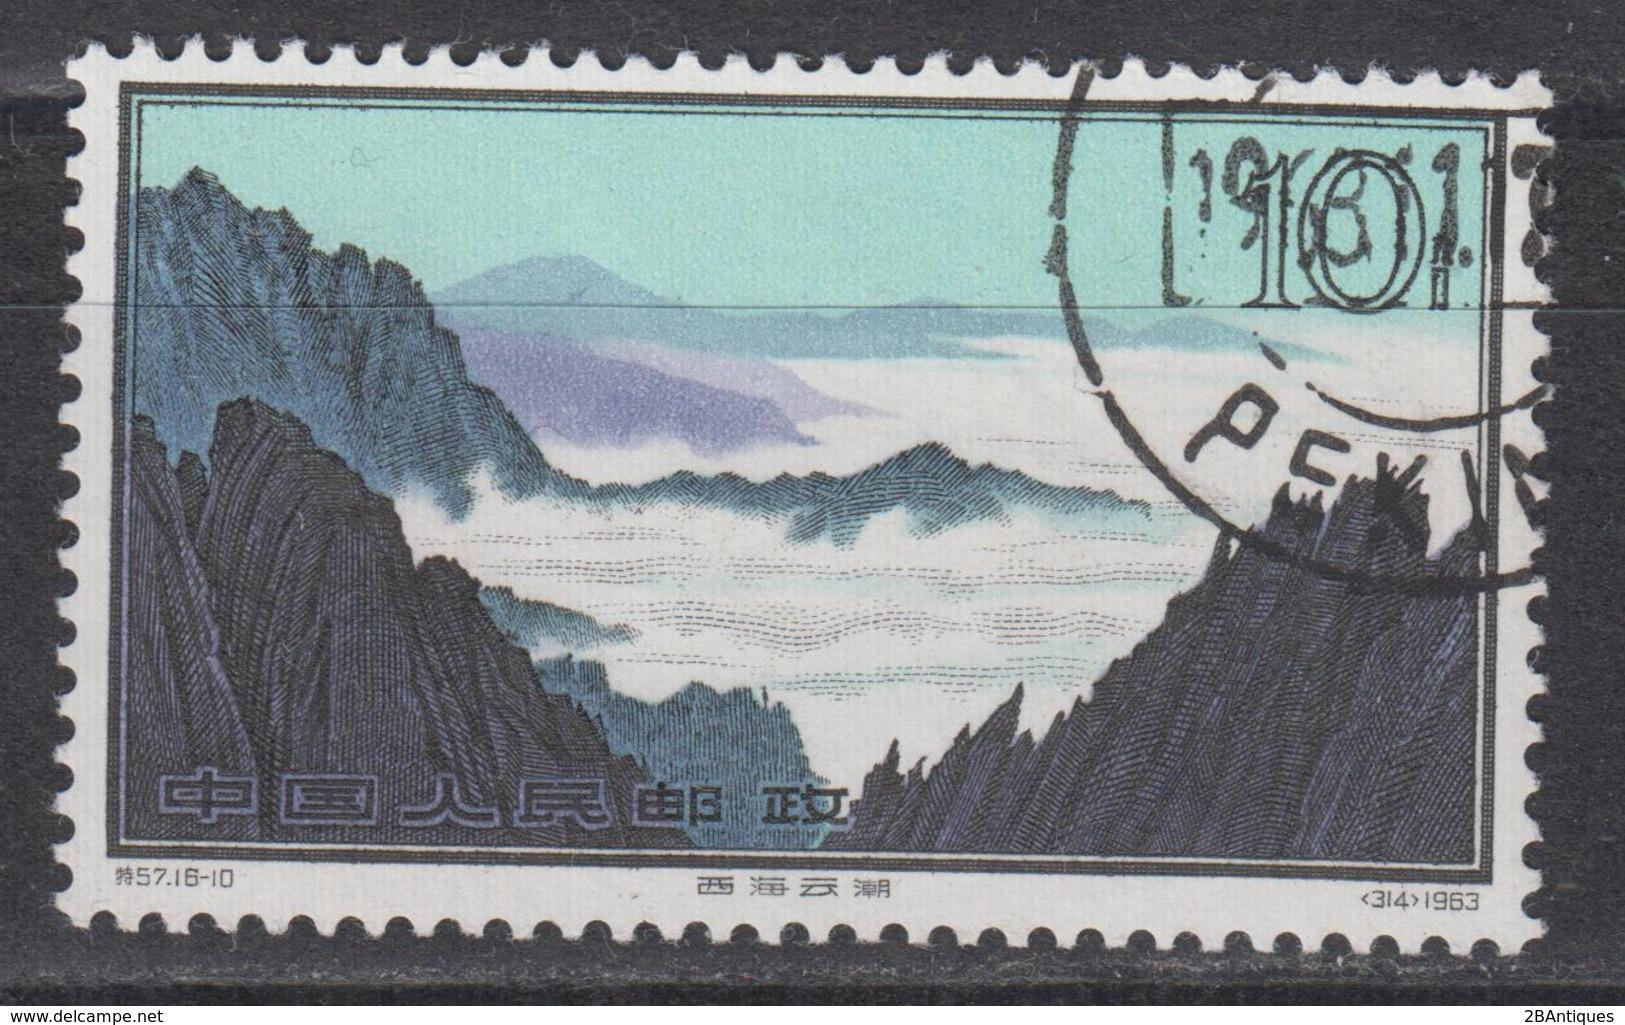 PR CHINA 1963 - 10分 Hwangshan Landscapes 中國郵票1963年10分黃山風景區 - Usati